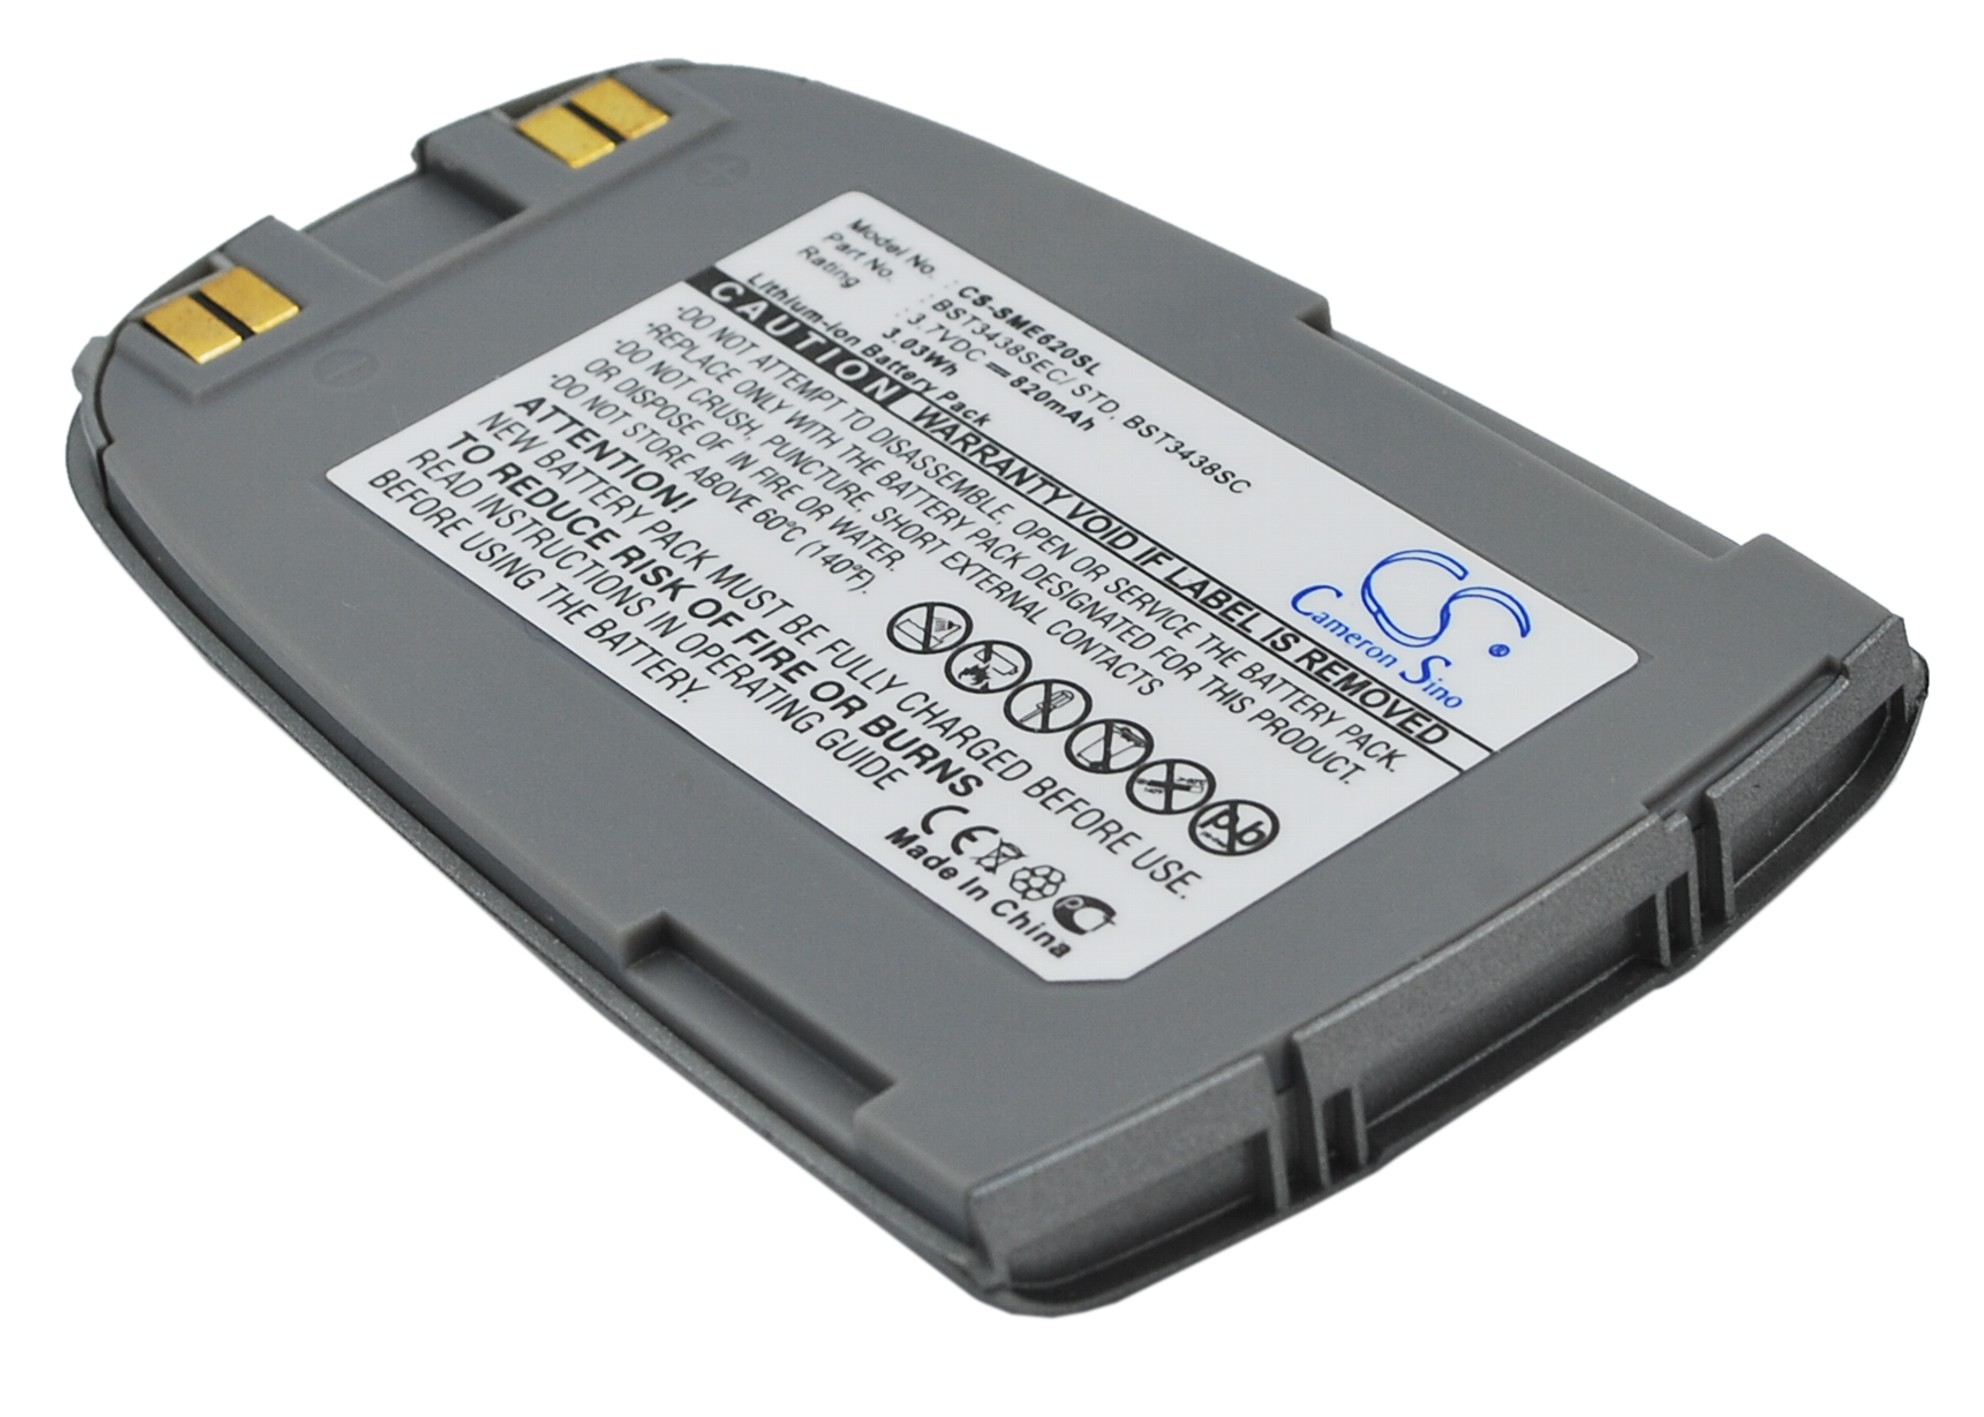 Cameron Sino baterie do mobilů pro SAMSUNG SGH-E620 3.7V Li-ion 820mAh šedá - neoriginální